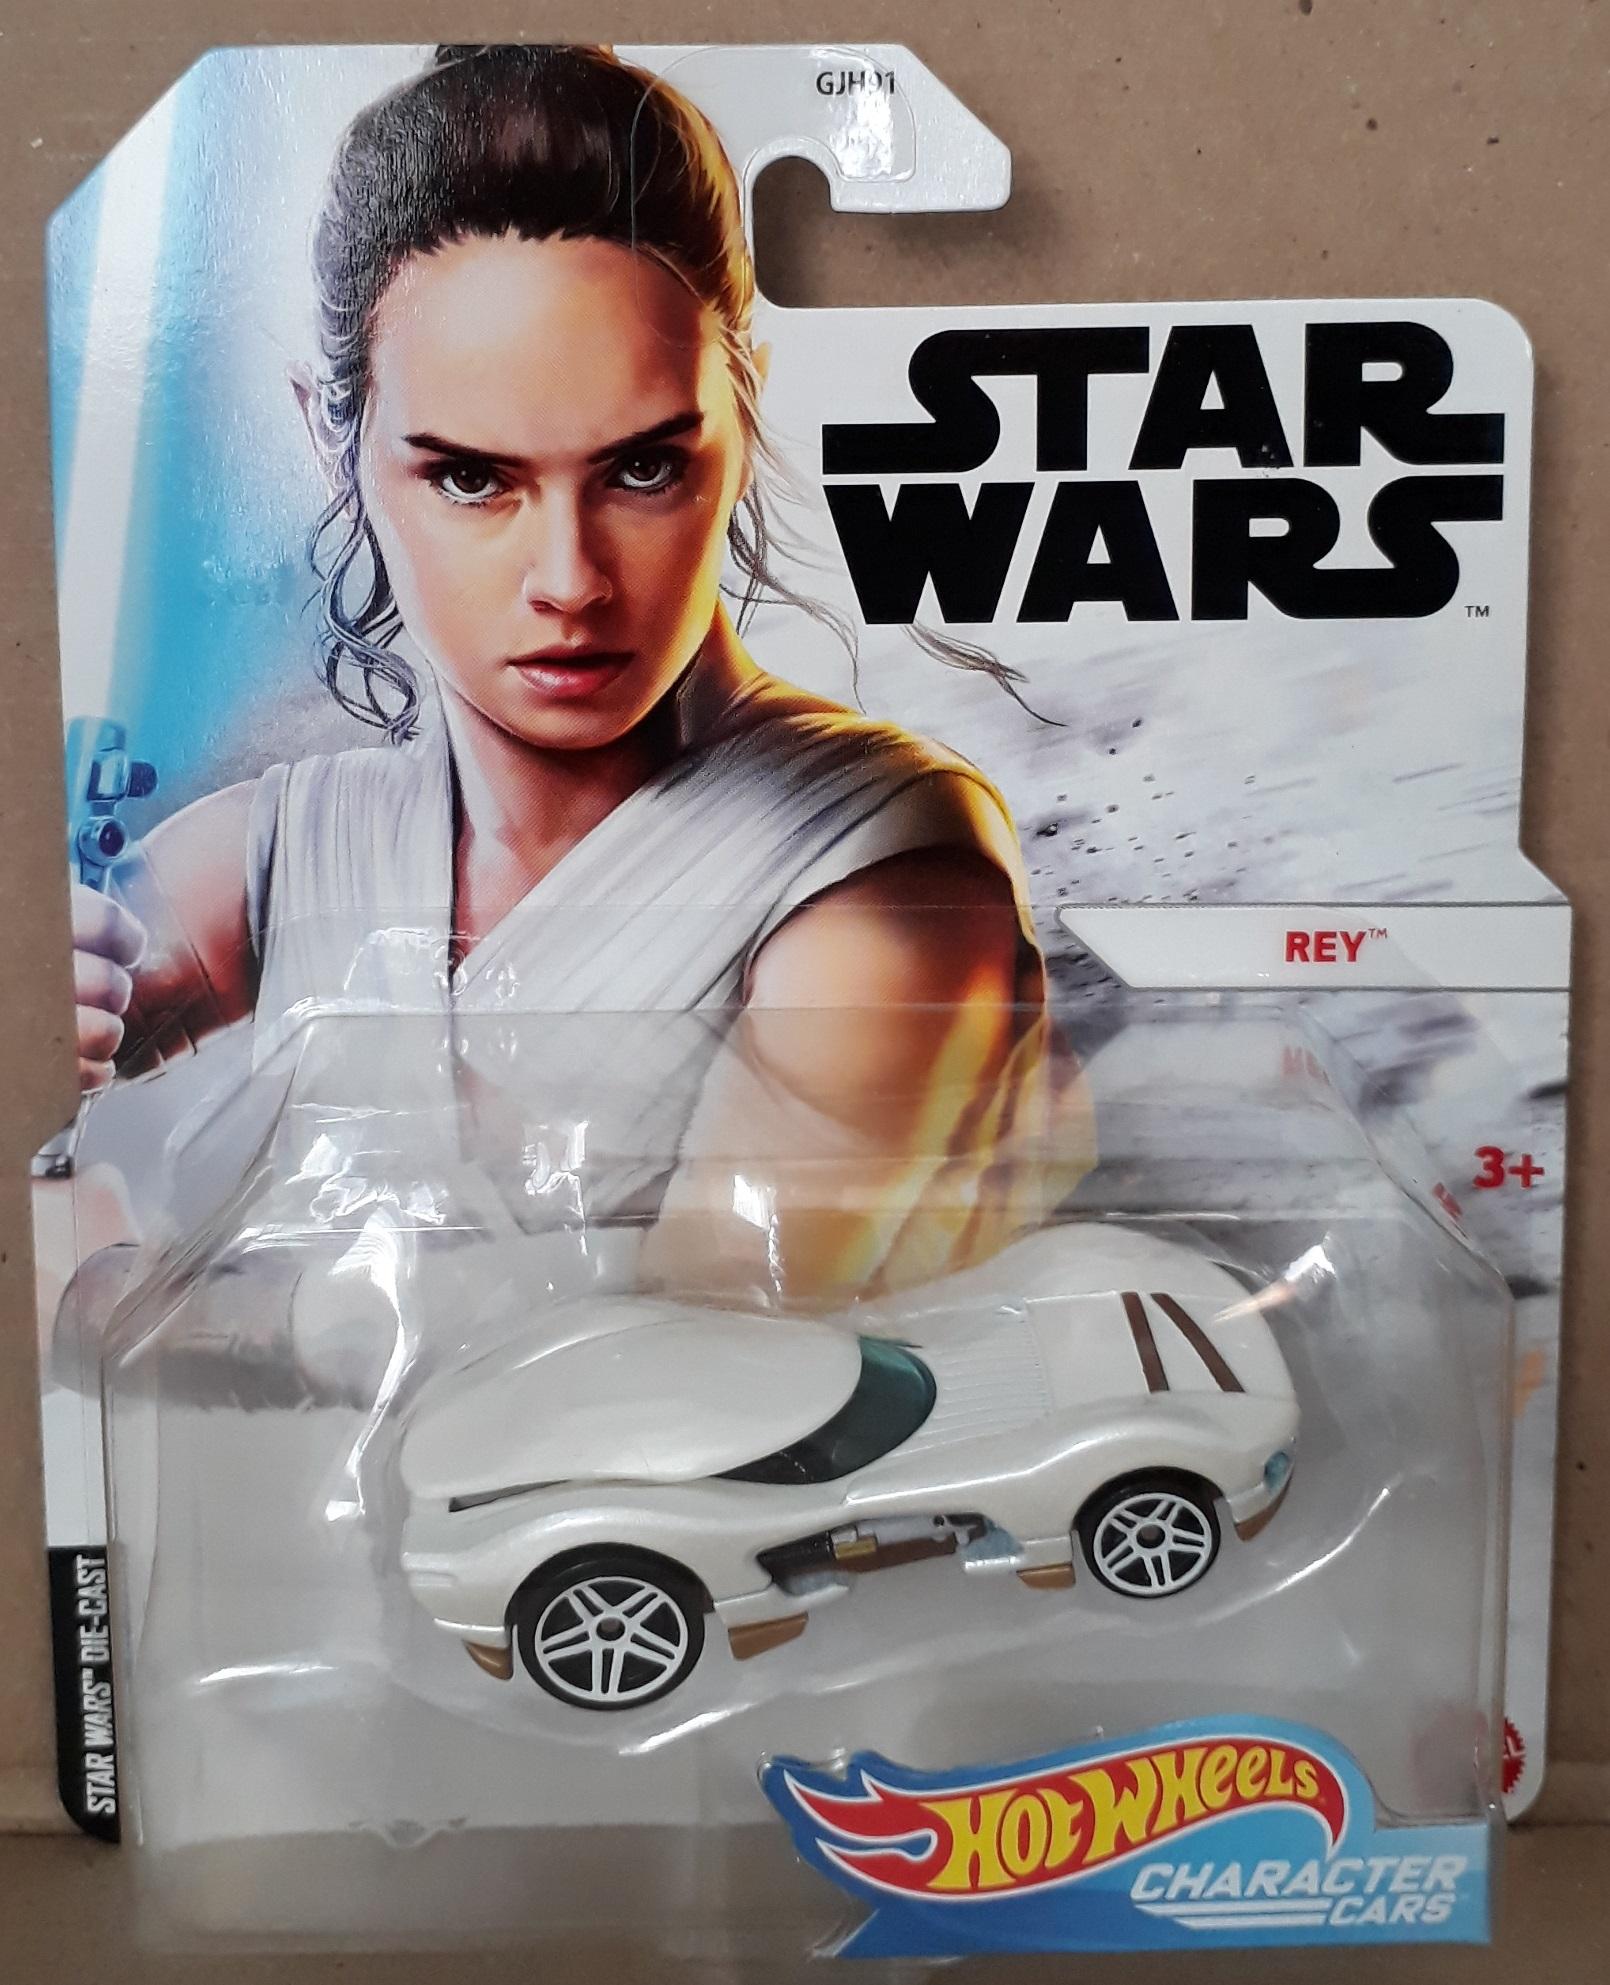 Rey (The Rise of Skywalker)